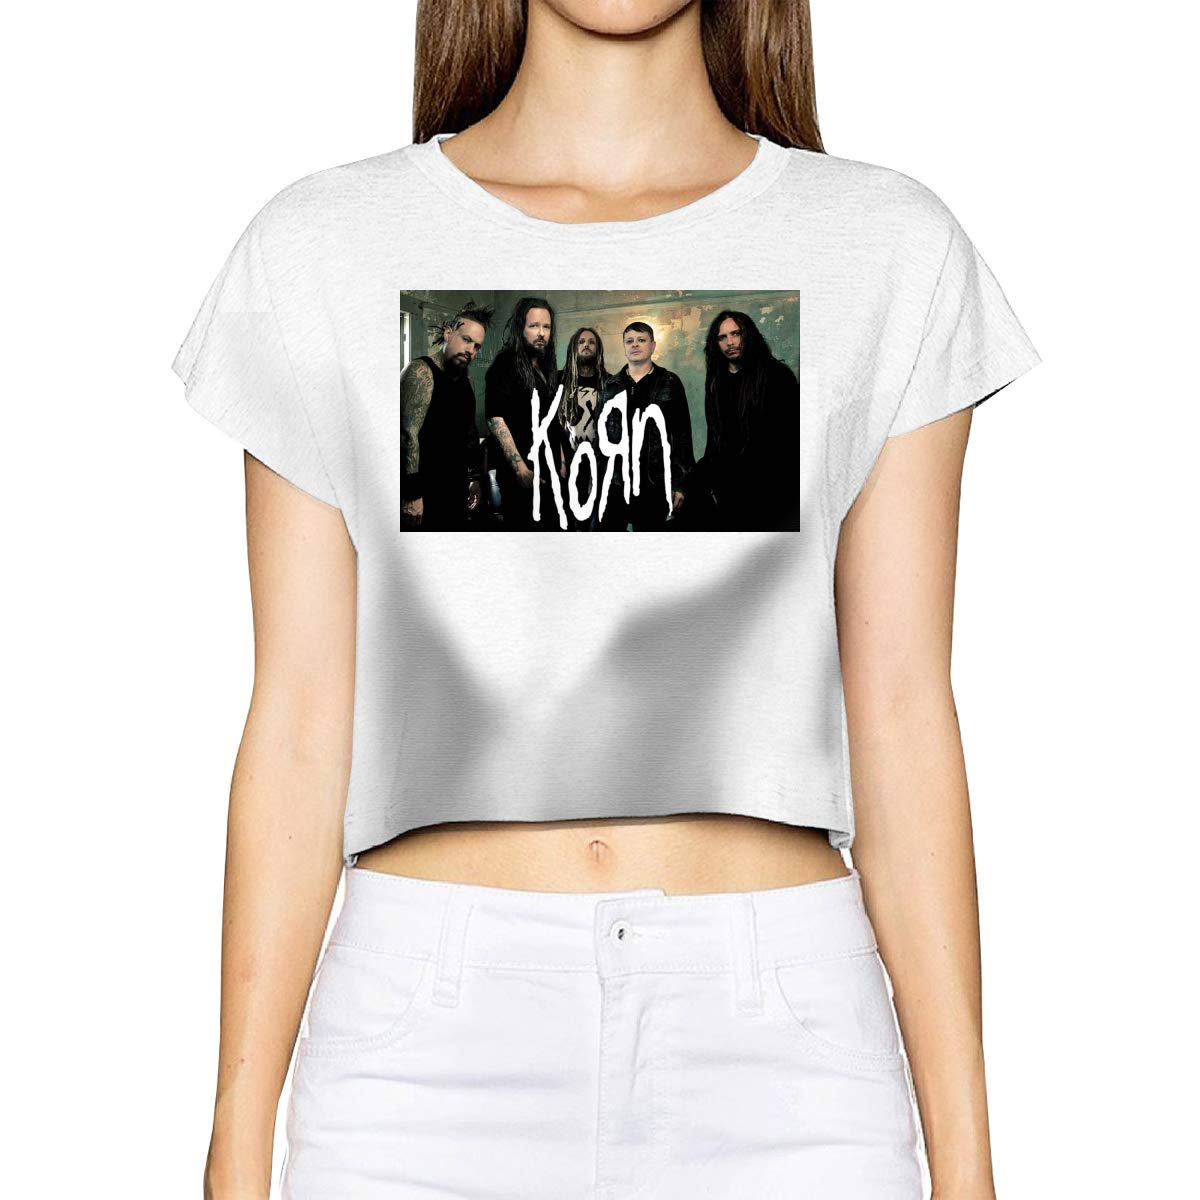 Warshland Women Crop Tops Korn Logo Short Sleeve Basic T Shirt Crew Neck